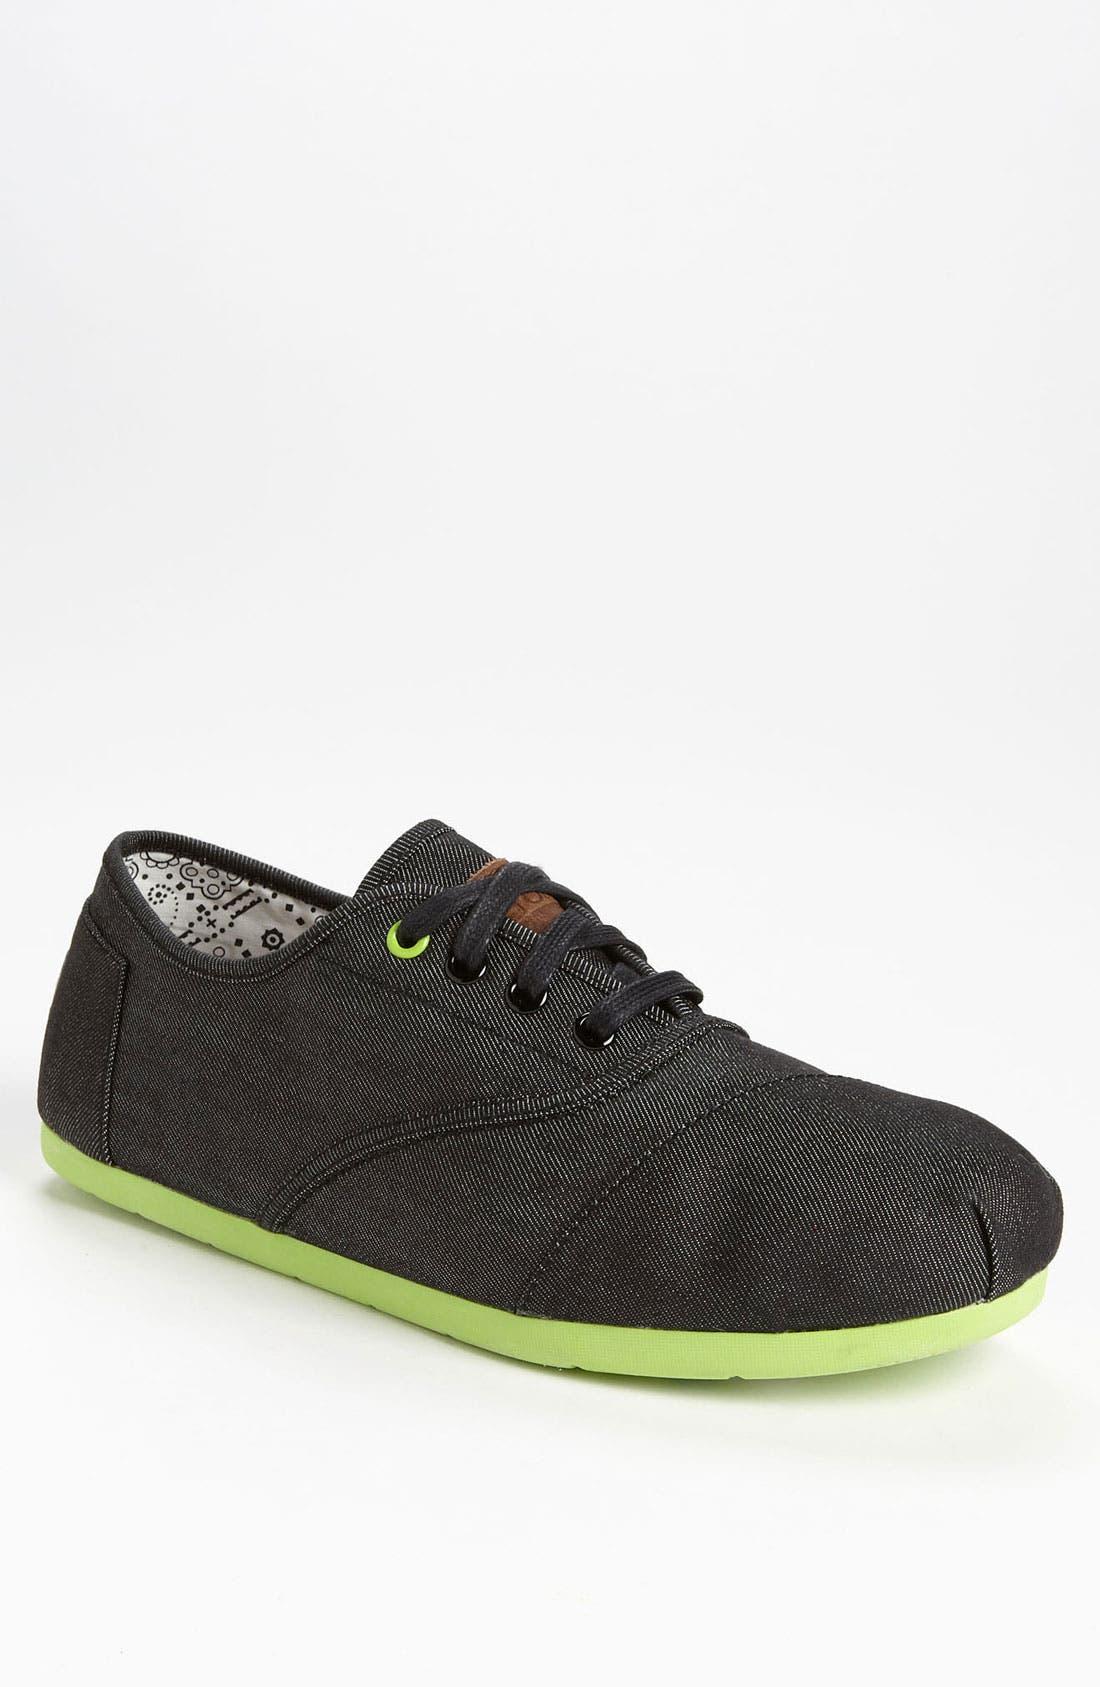 Main Image - TOMS 'Cordones' Denim Sneaker (Men)